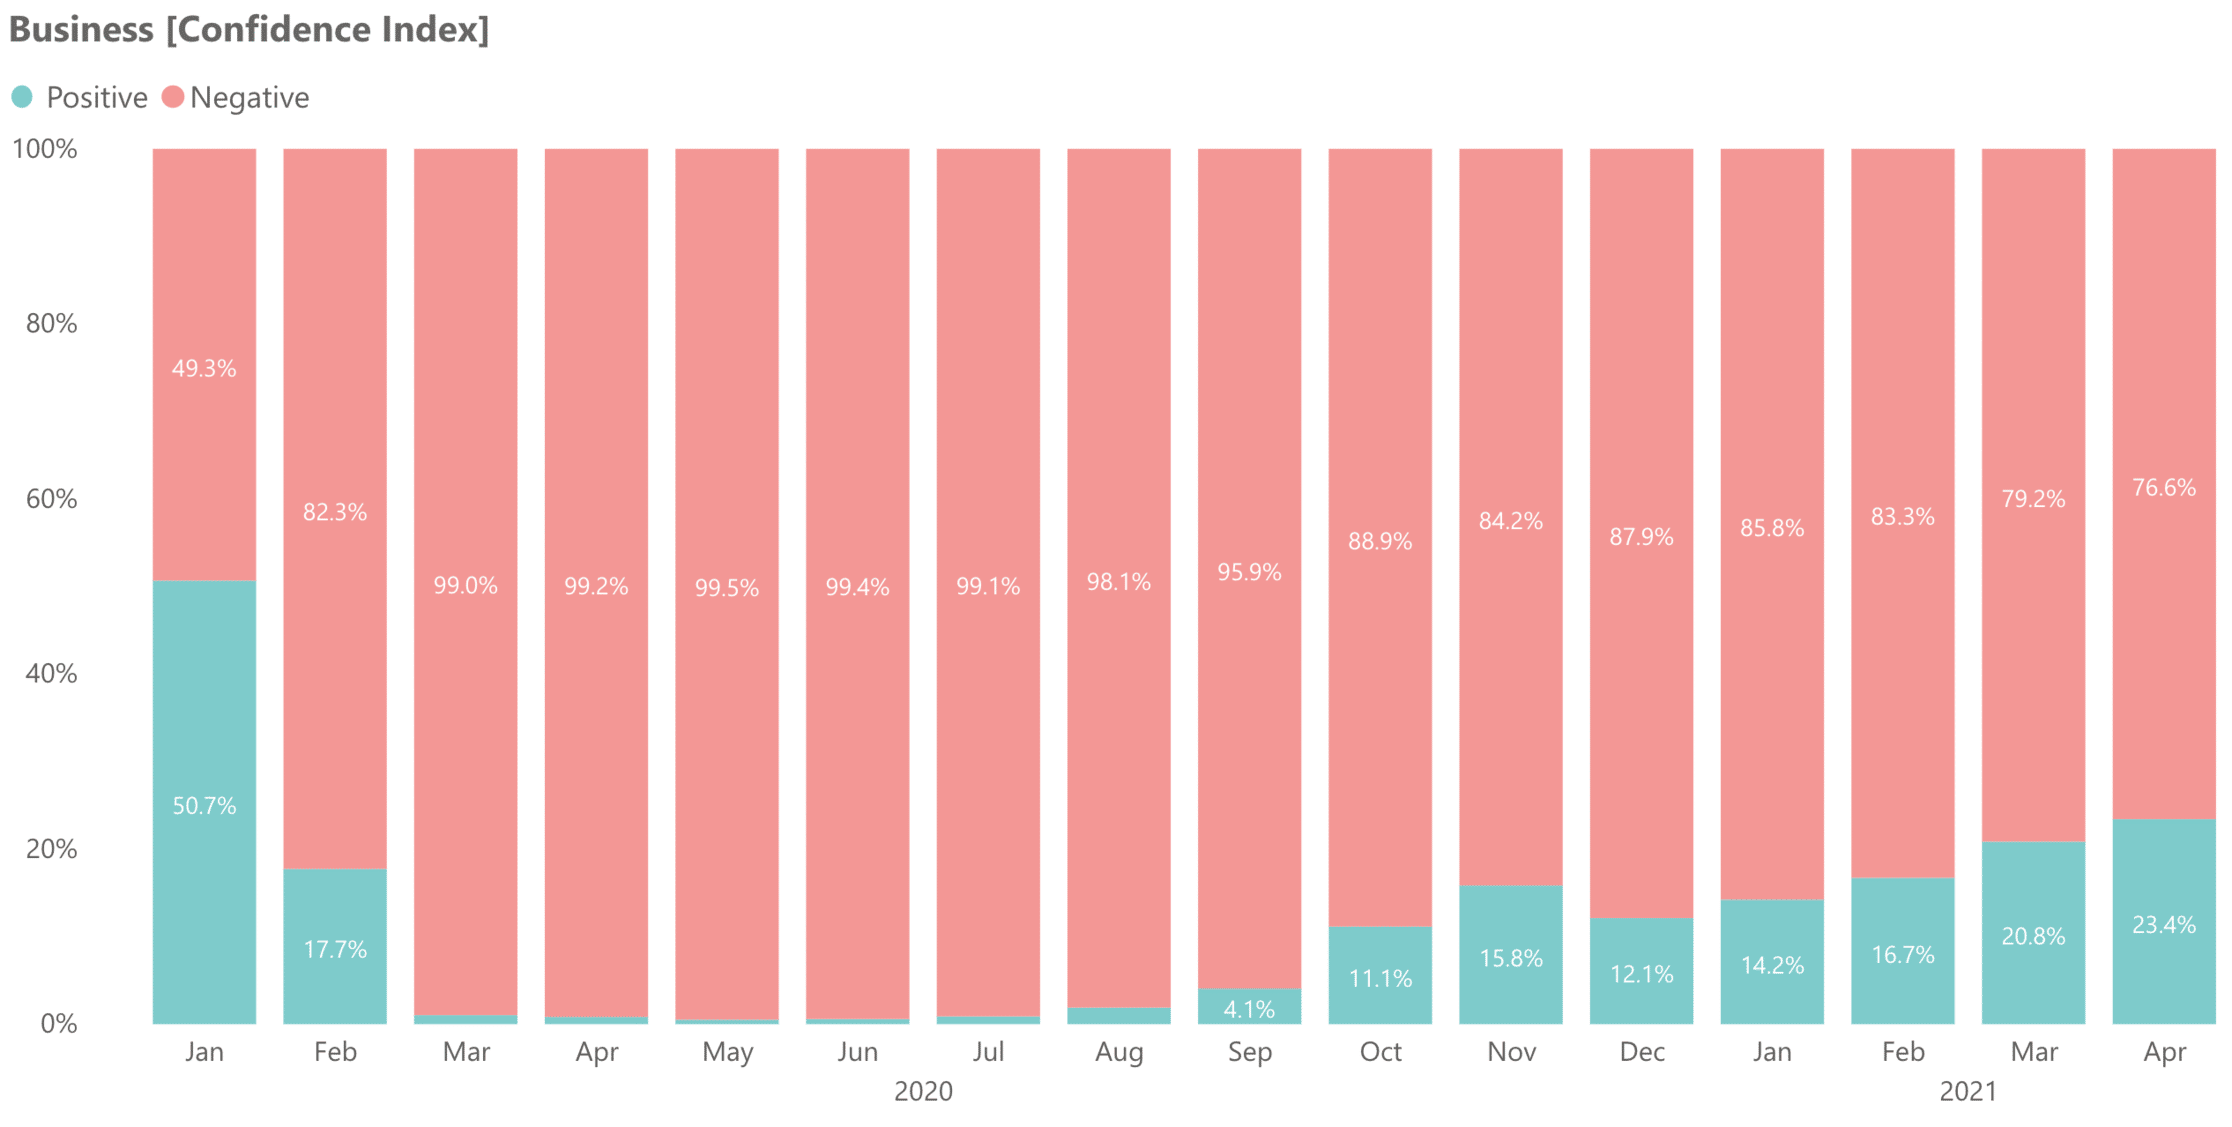 The KSA's business confidence index